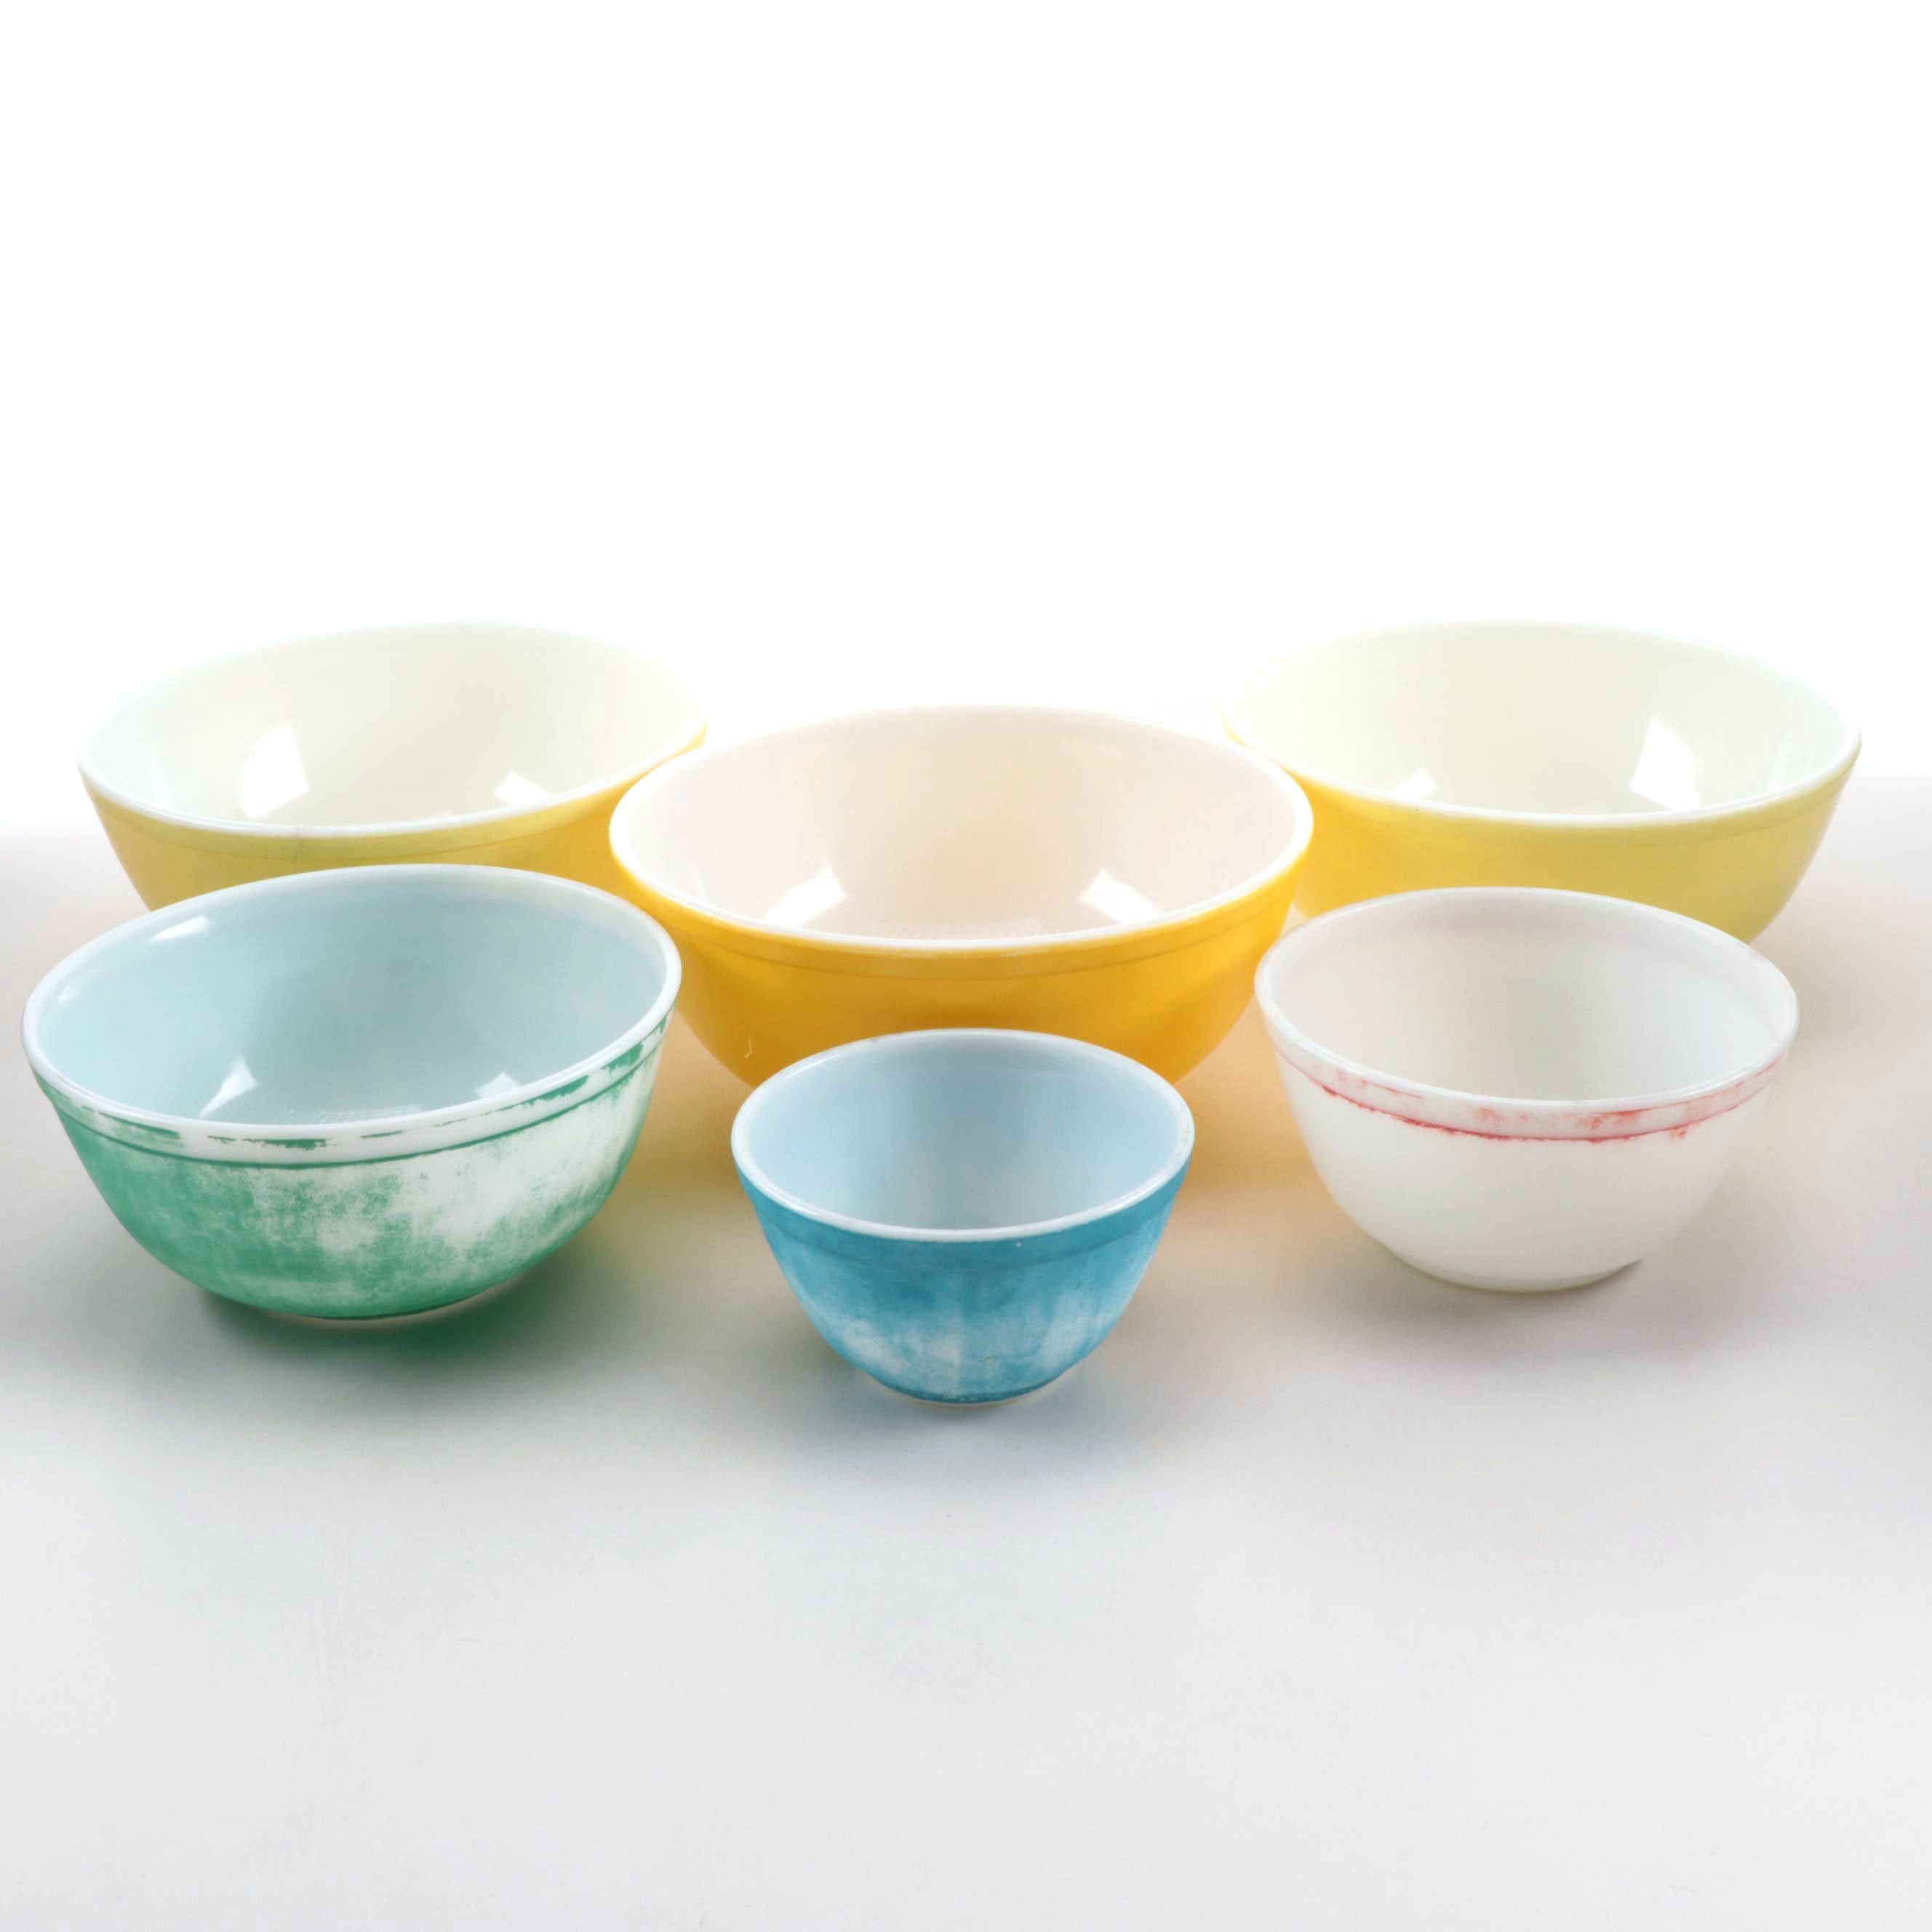 "Vintage Pyrex ""Primary Colors"" Nesting Bowls c. 1945-49"